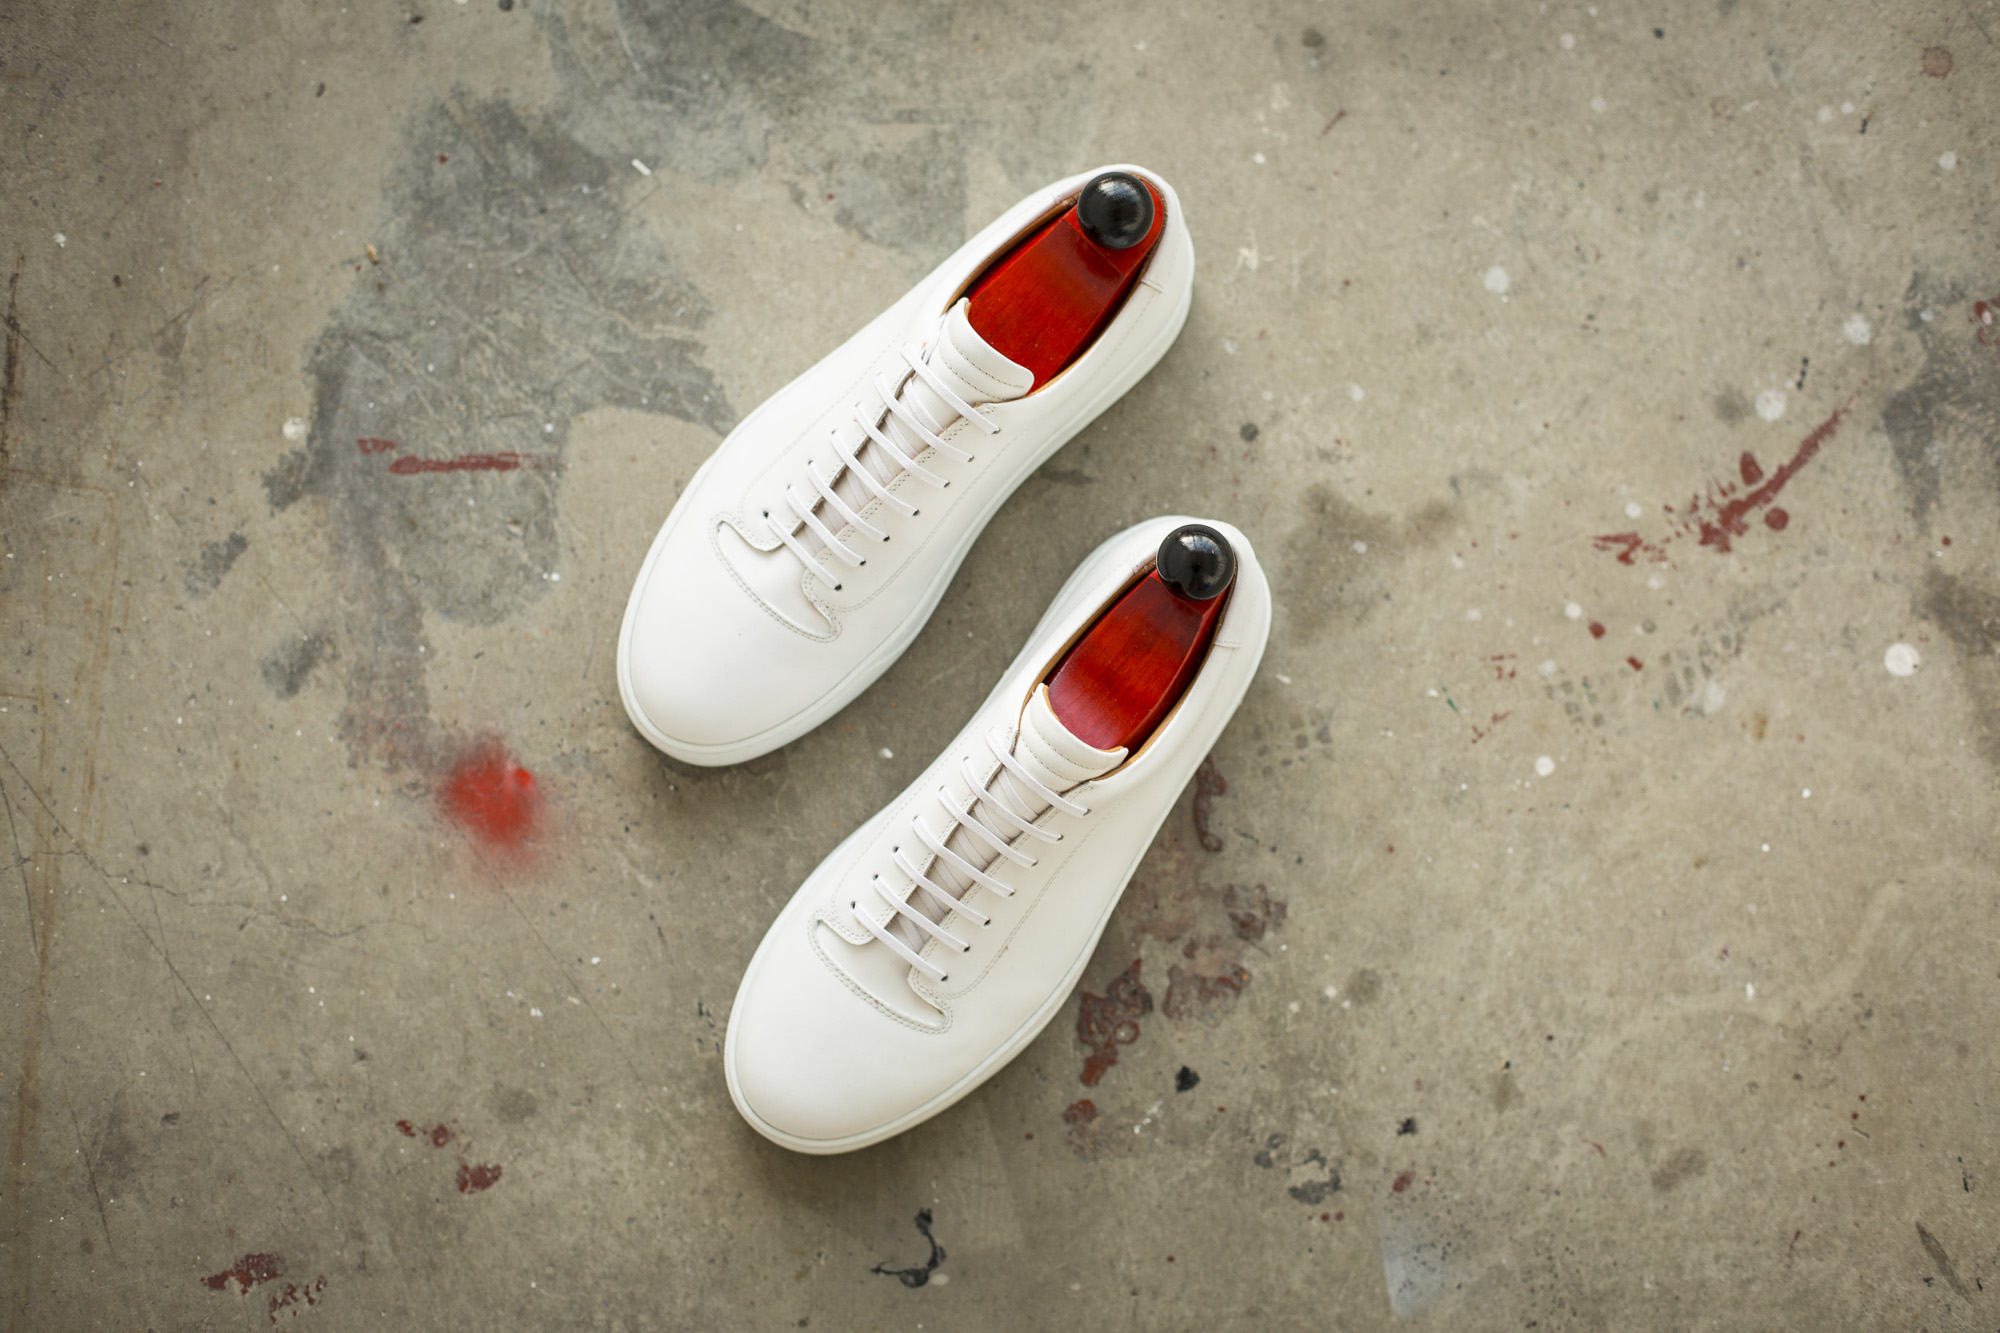 j-fitzpatrick-footwear-collection-9-november-2017-hero-trainers-0215.jpg